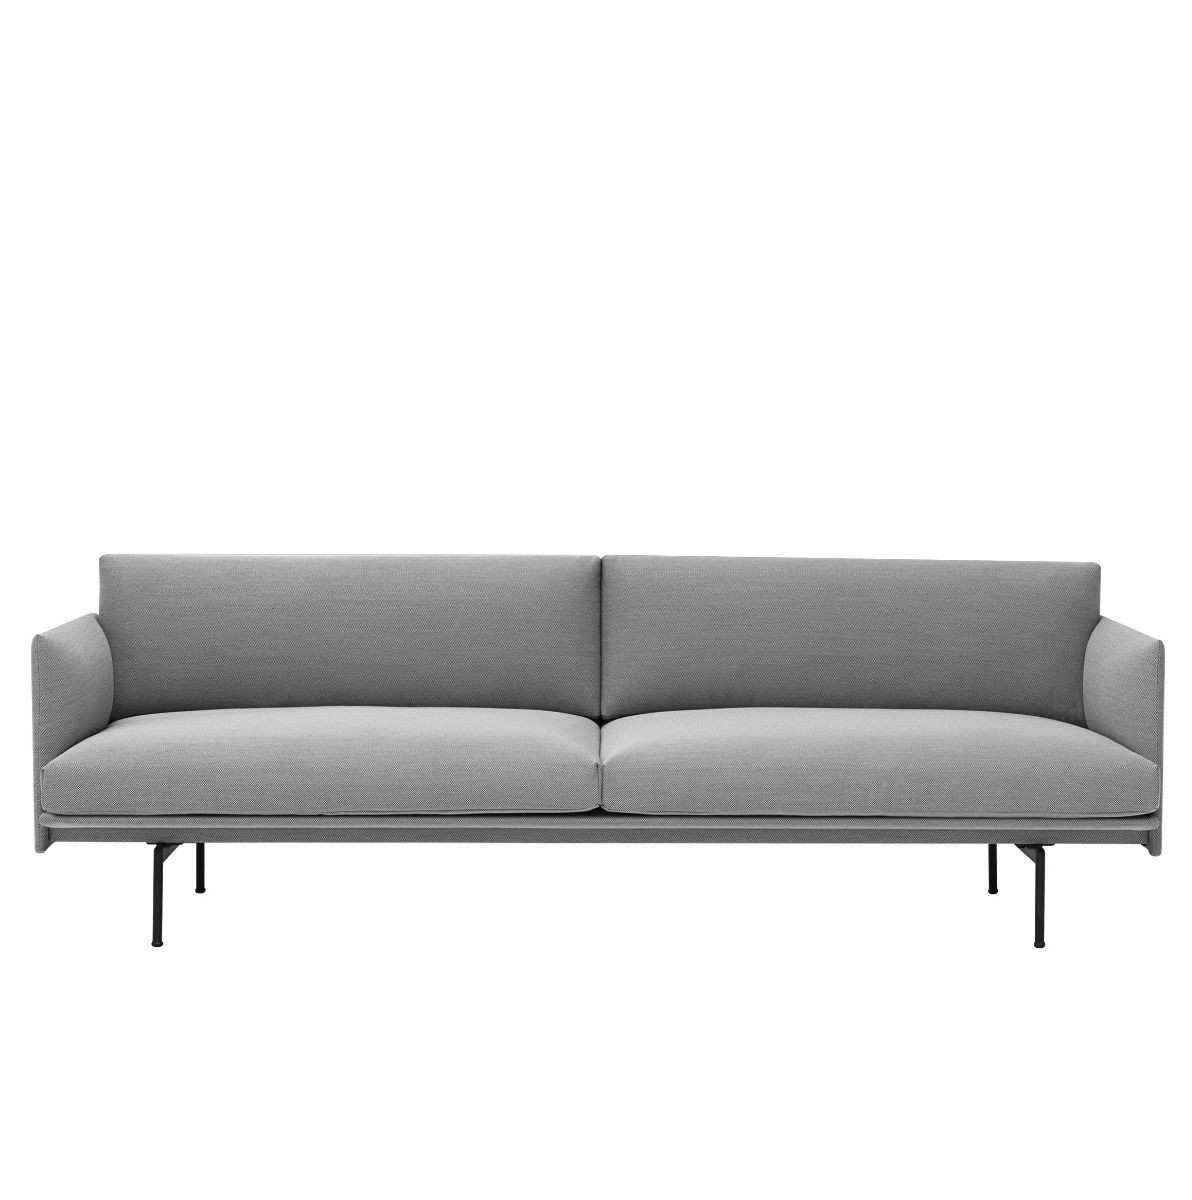 Muuto Outline 3 Seater Sofa